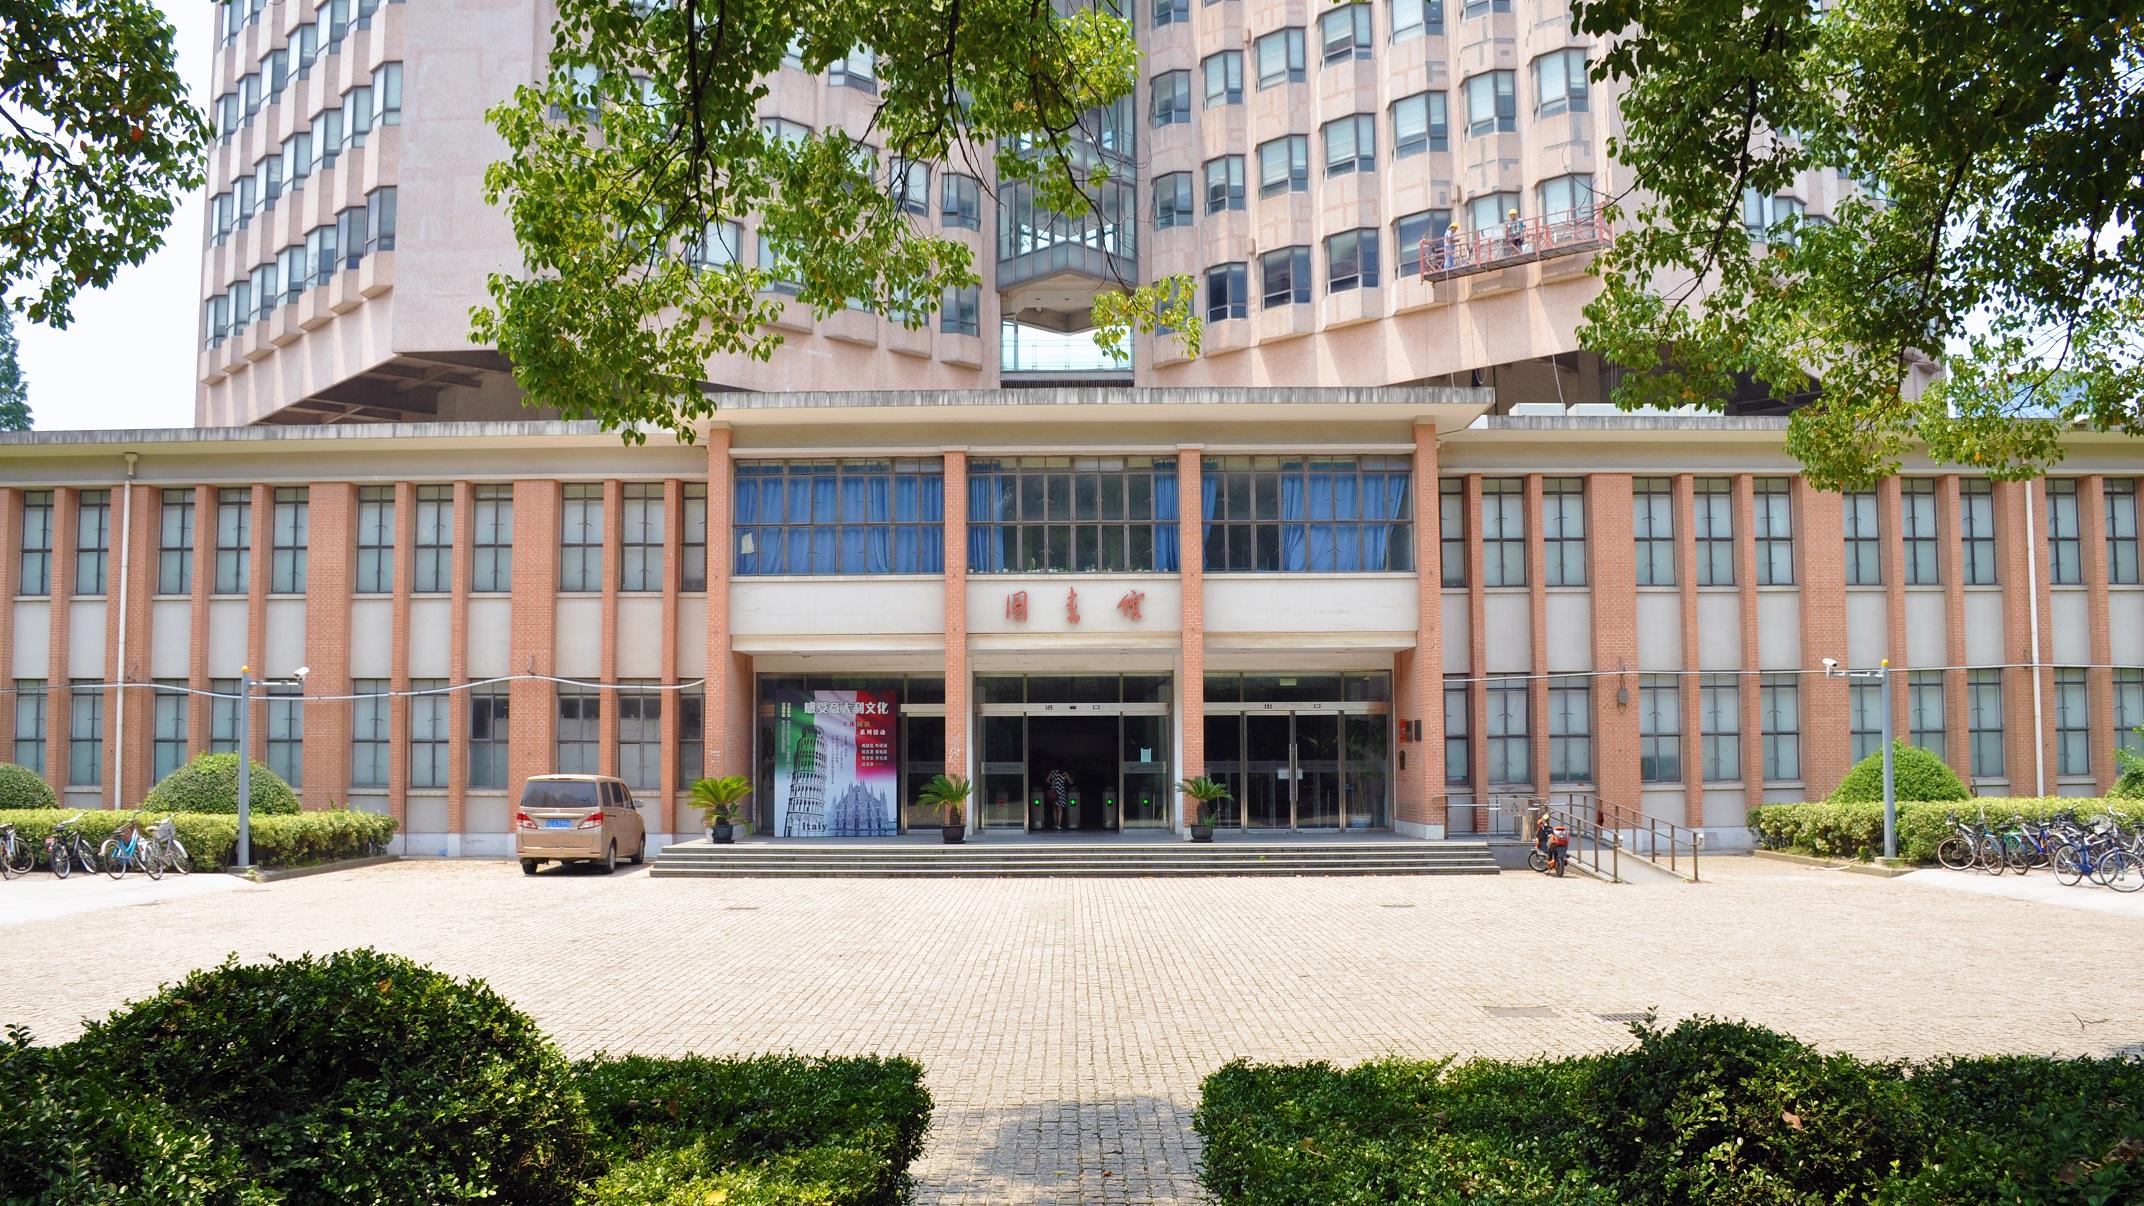 Университет Тунцзи (Tongji University), Шанхай